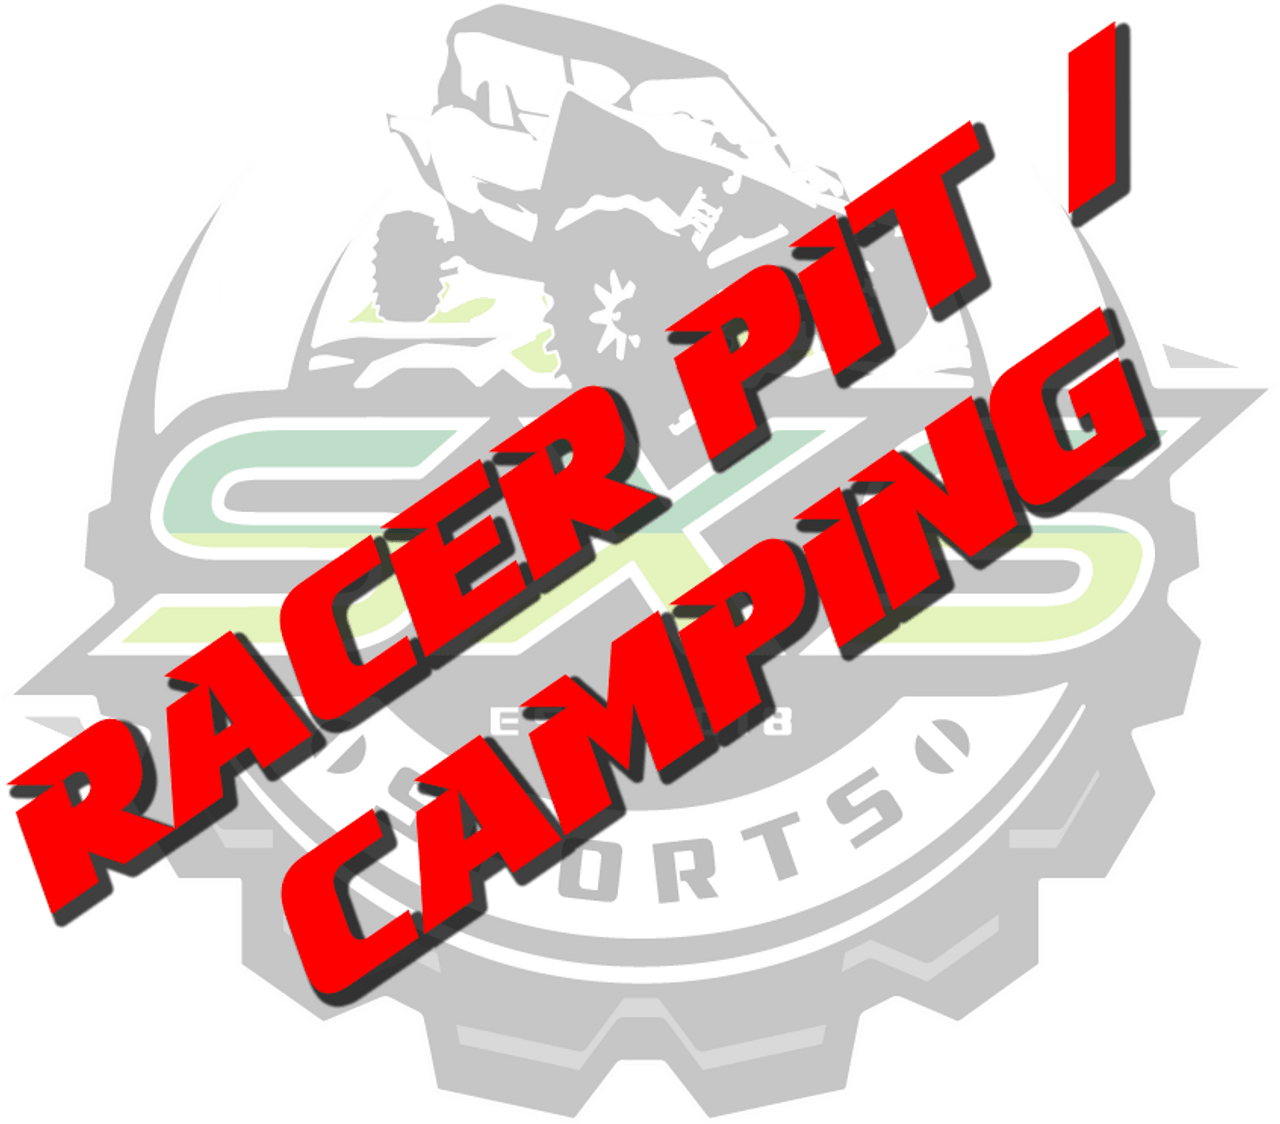 2020 SXS Sports - Racer Pit/Camping Spot (40x80) at Dirt City Motorplex